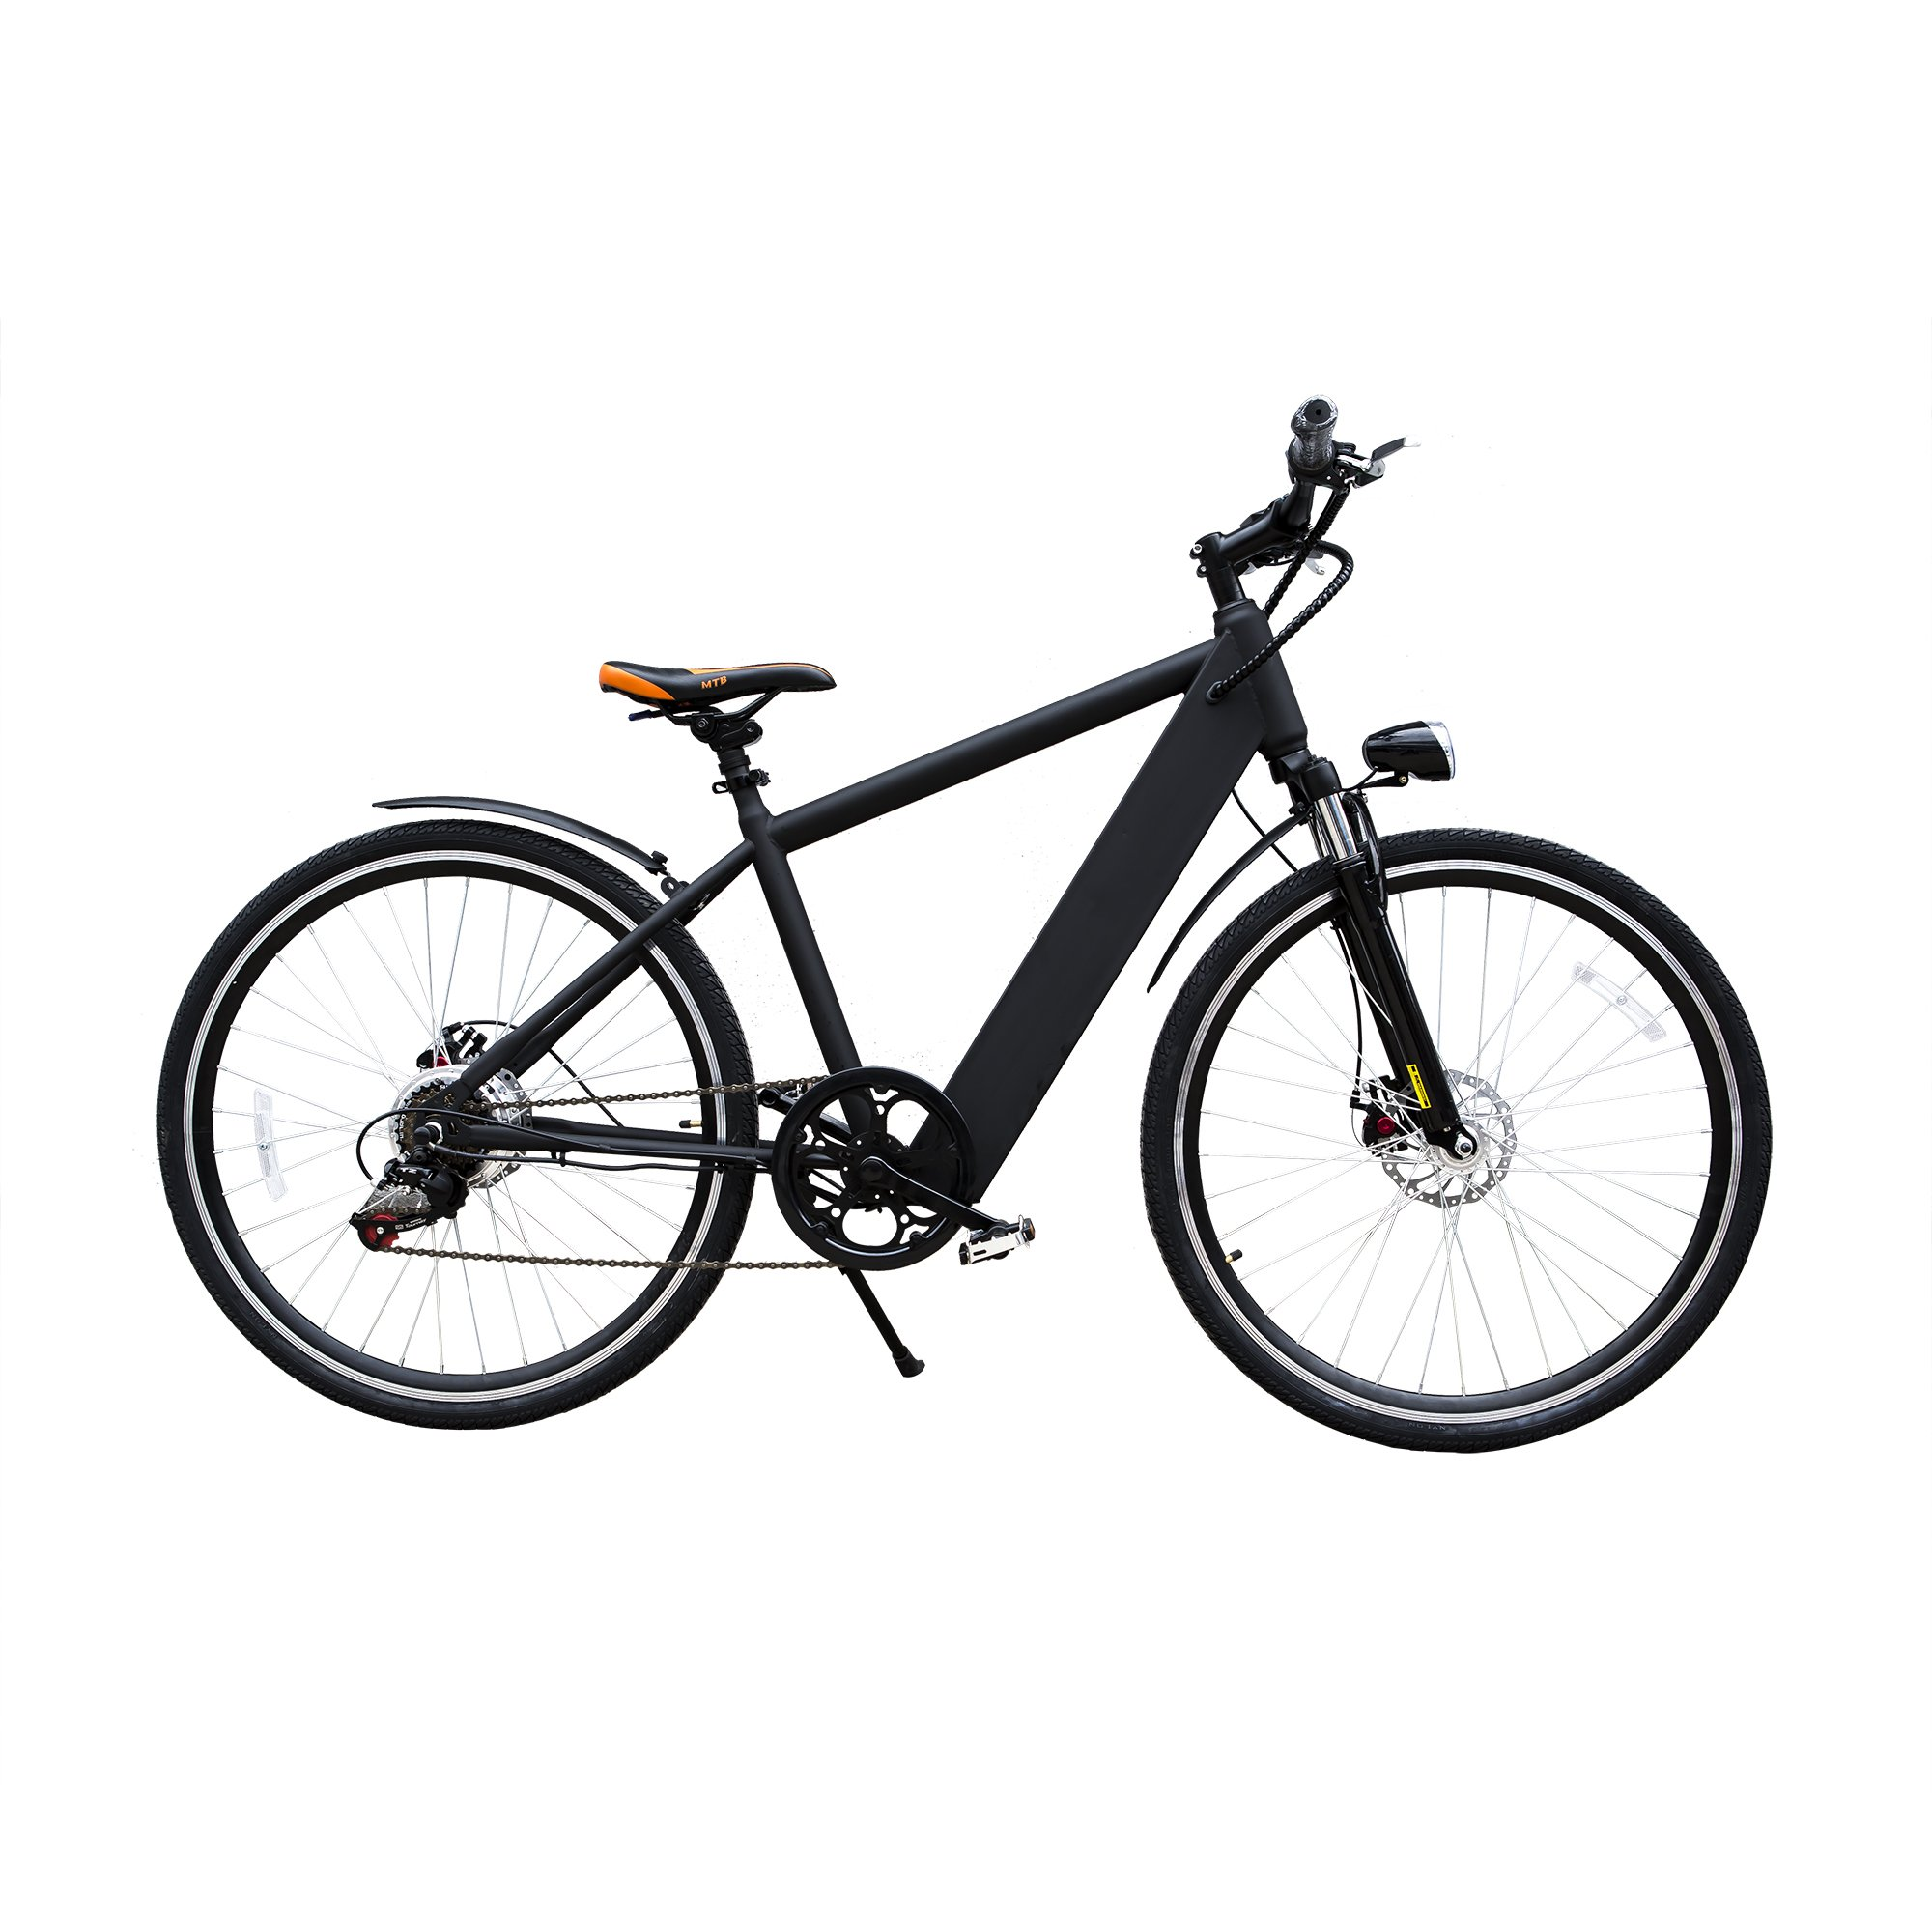 Nakto 26'' 300W Electric Mountaion Bike 6 speed e-Bike Removable 36V10A Lithium Battery